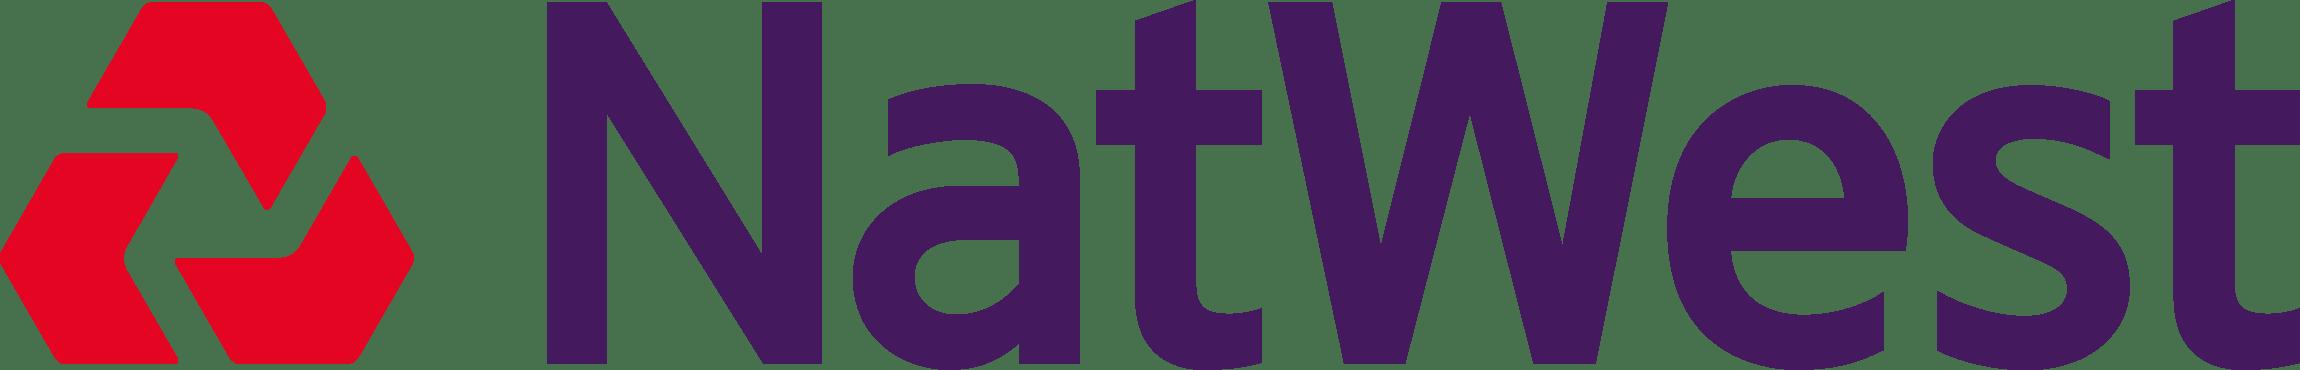 NatWest Logo png